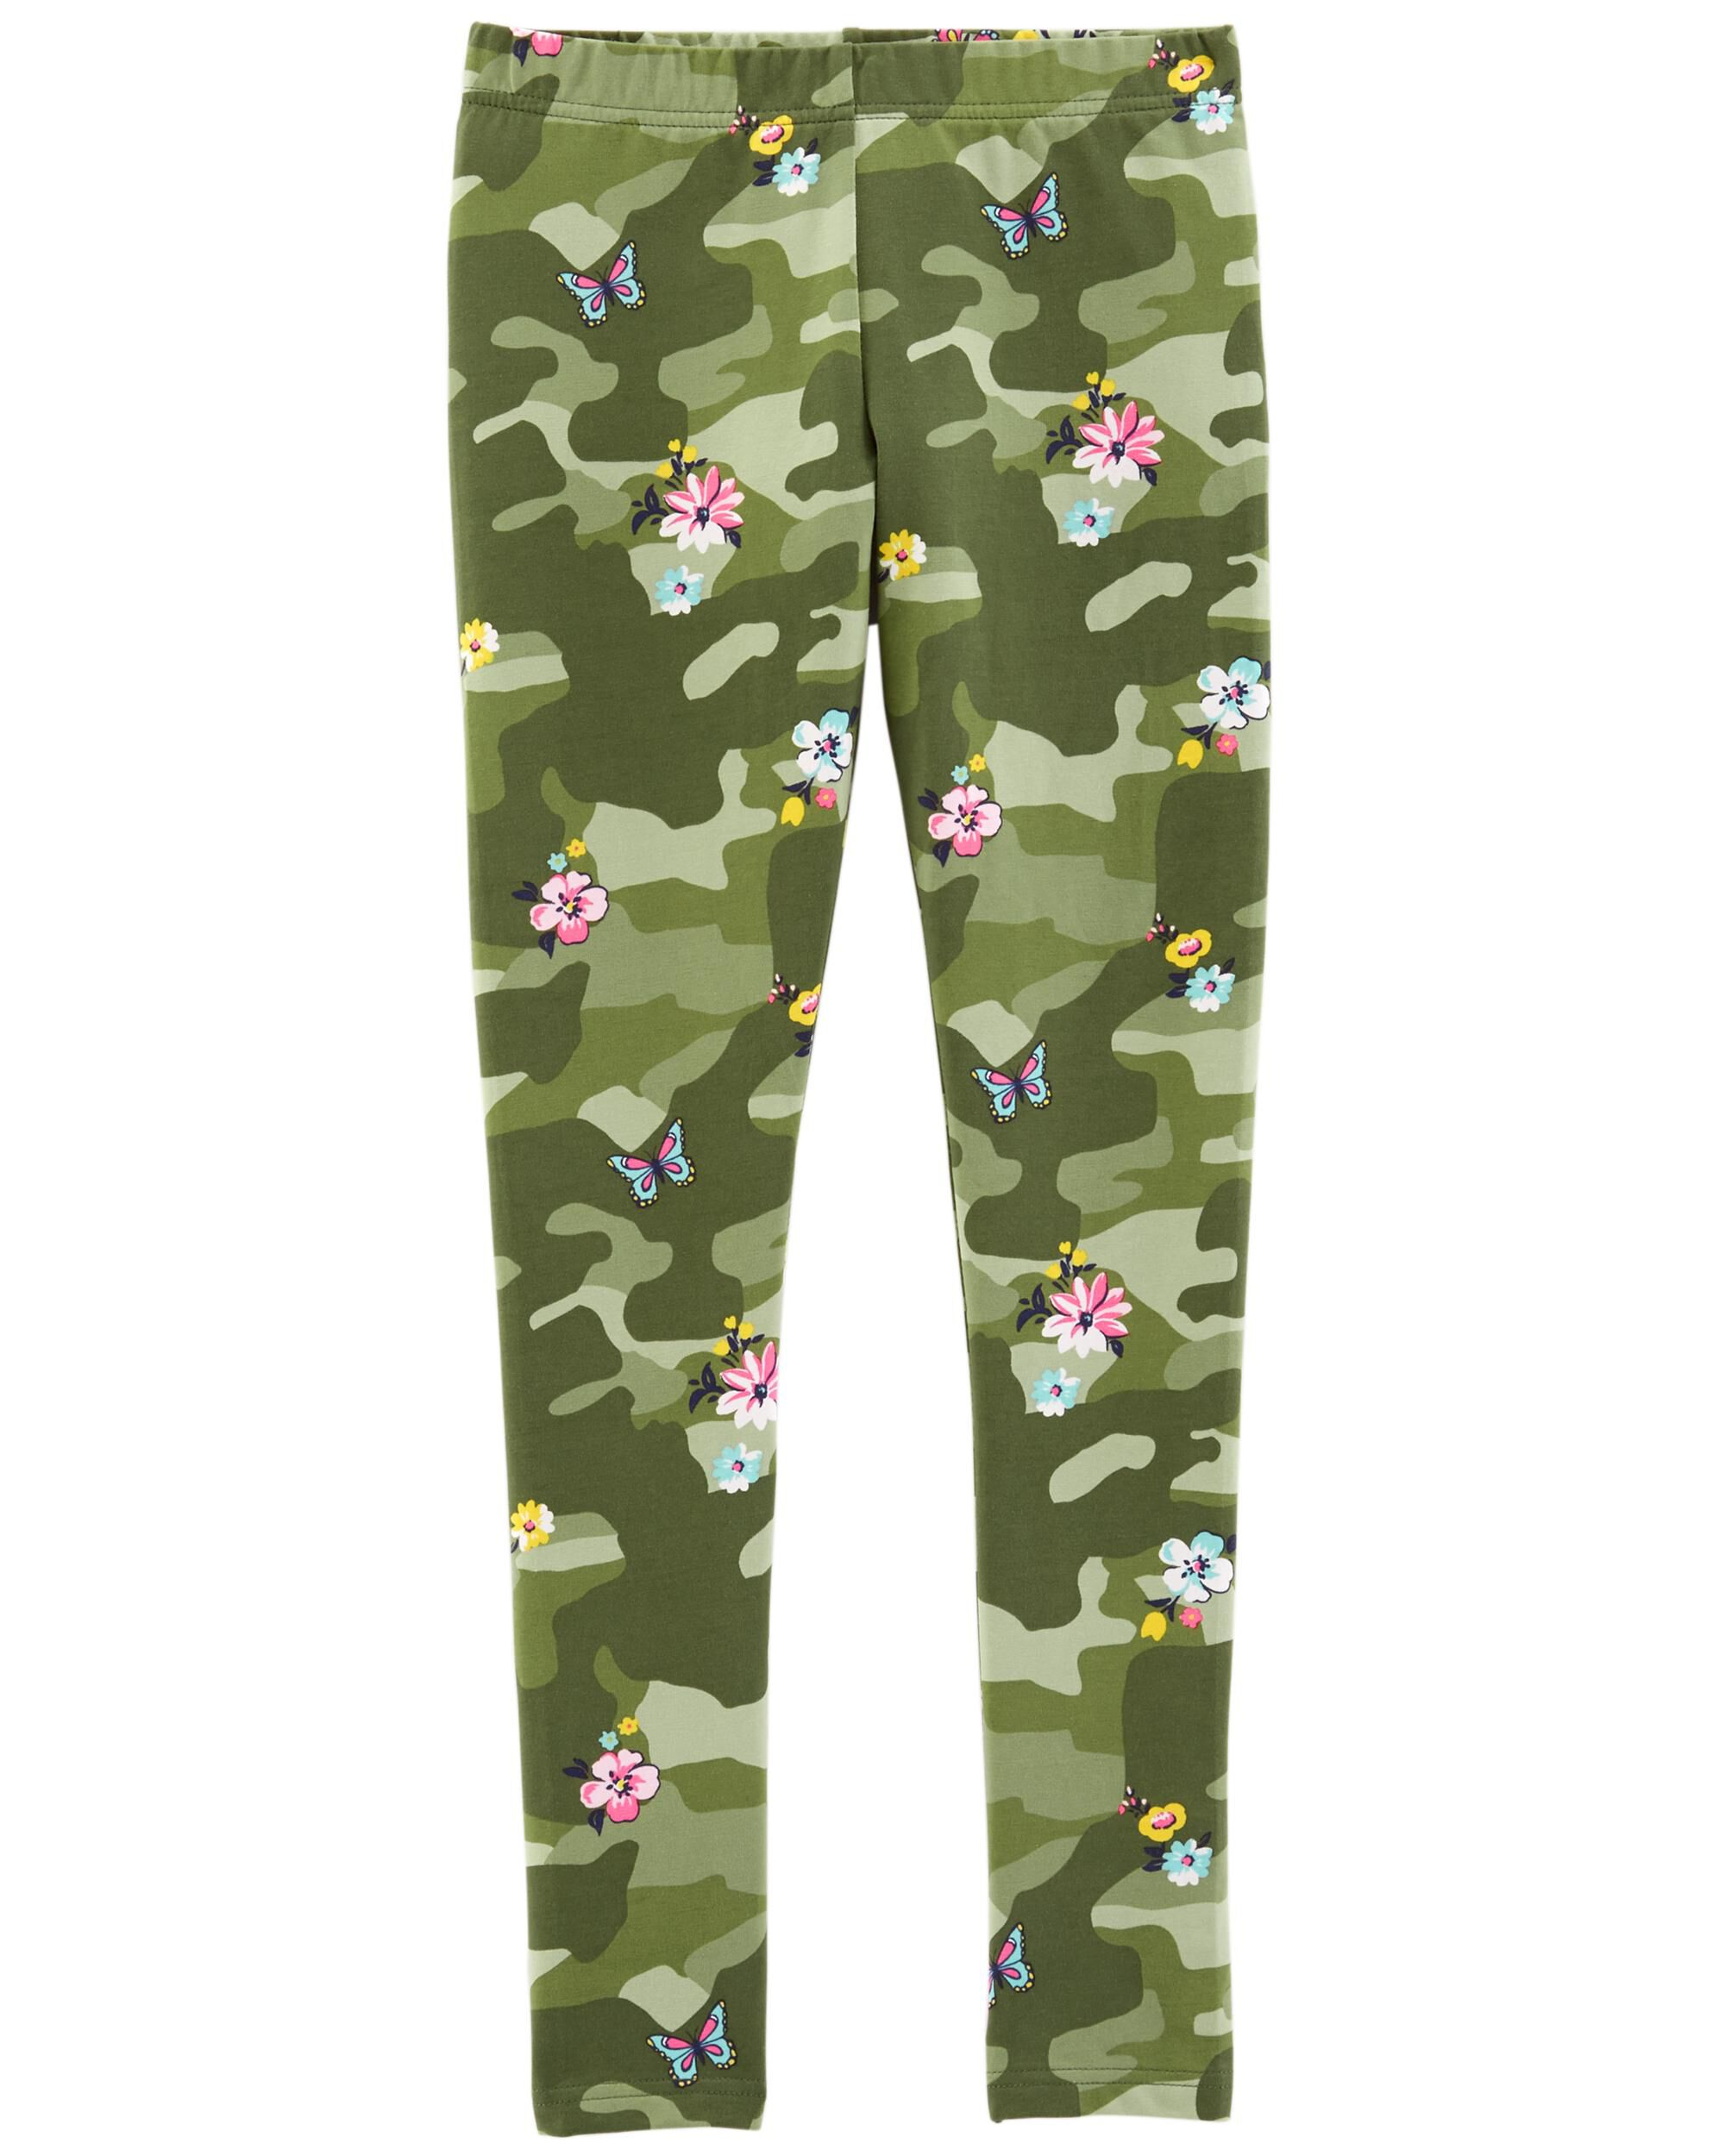 butterfly camouflage Kids leggings